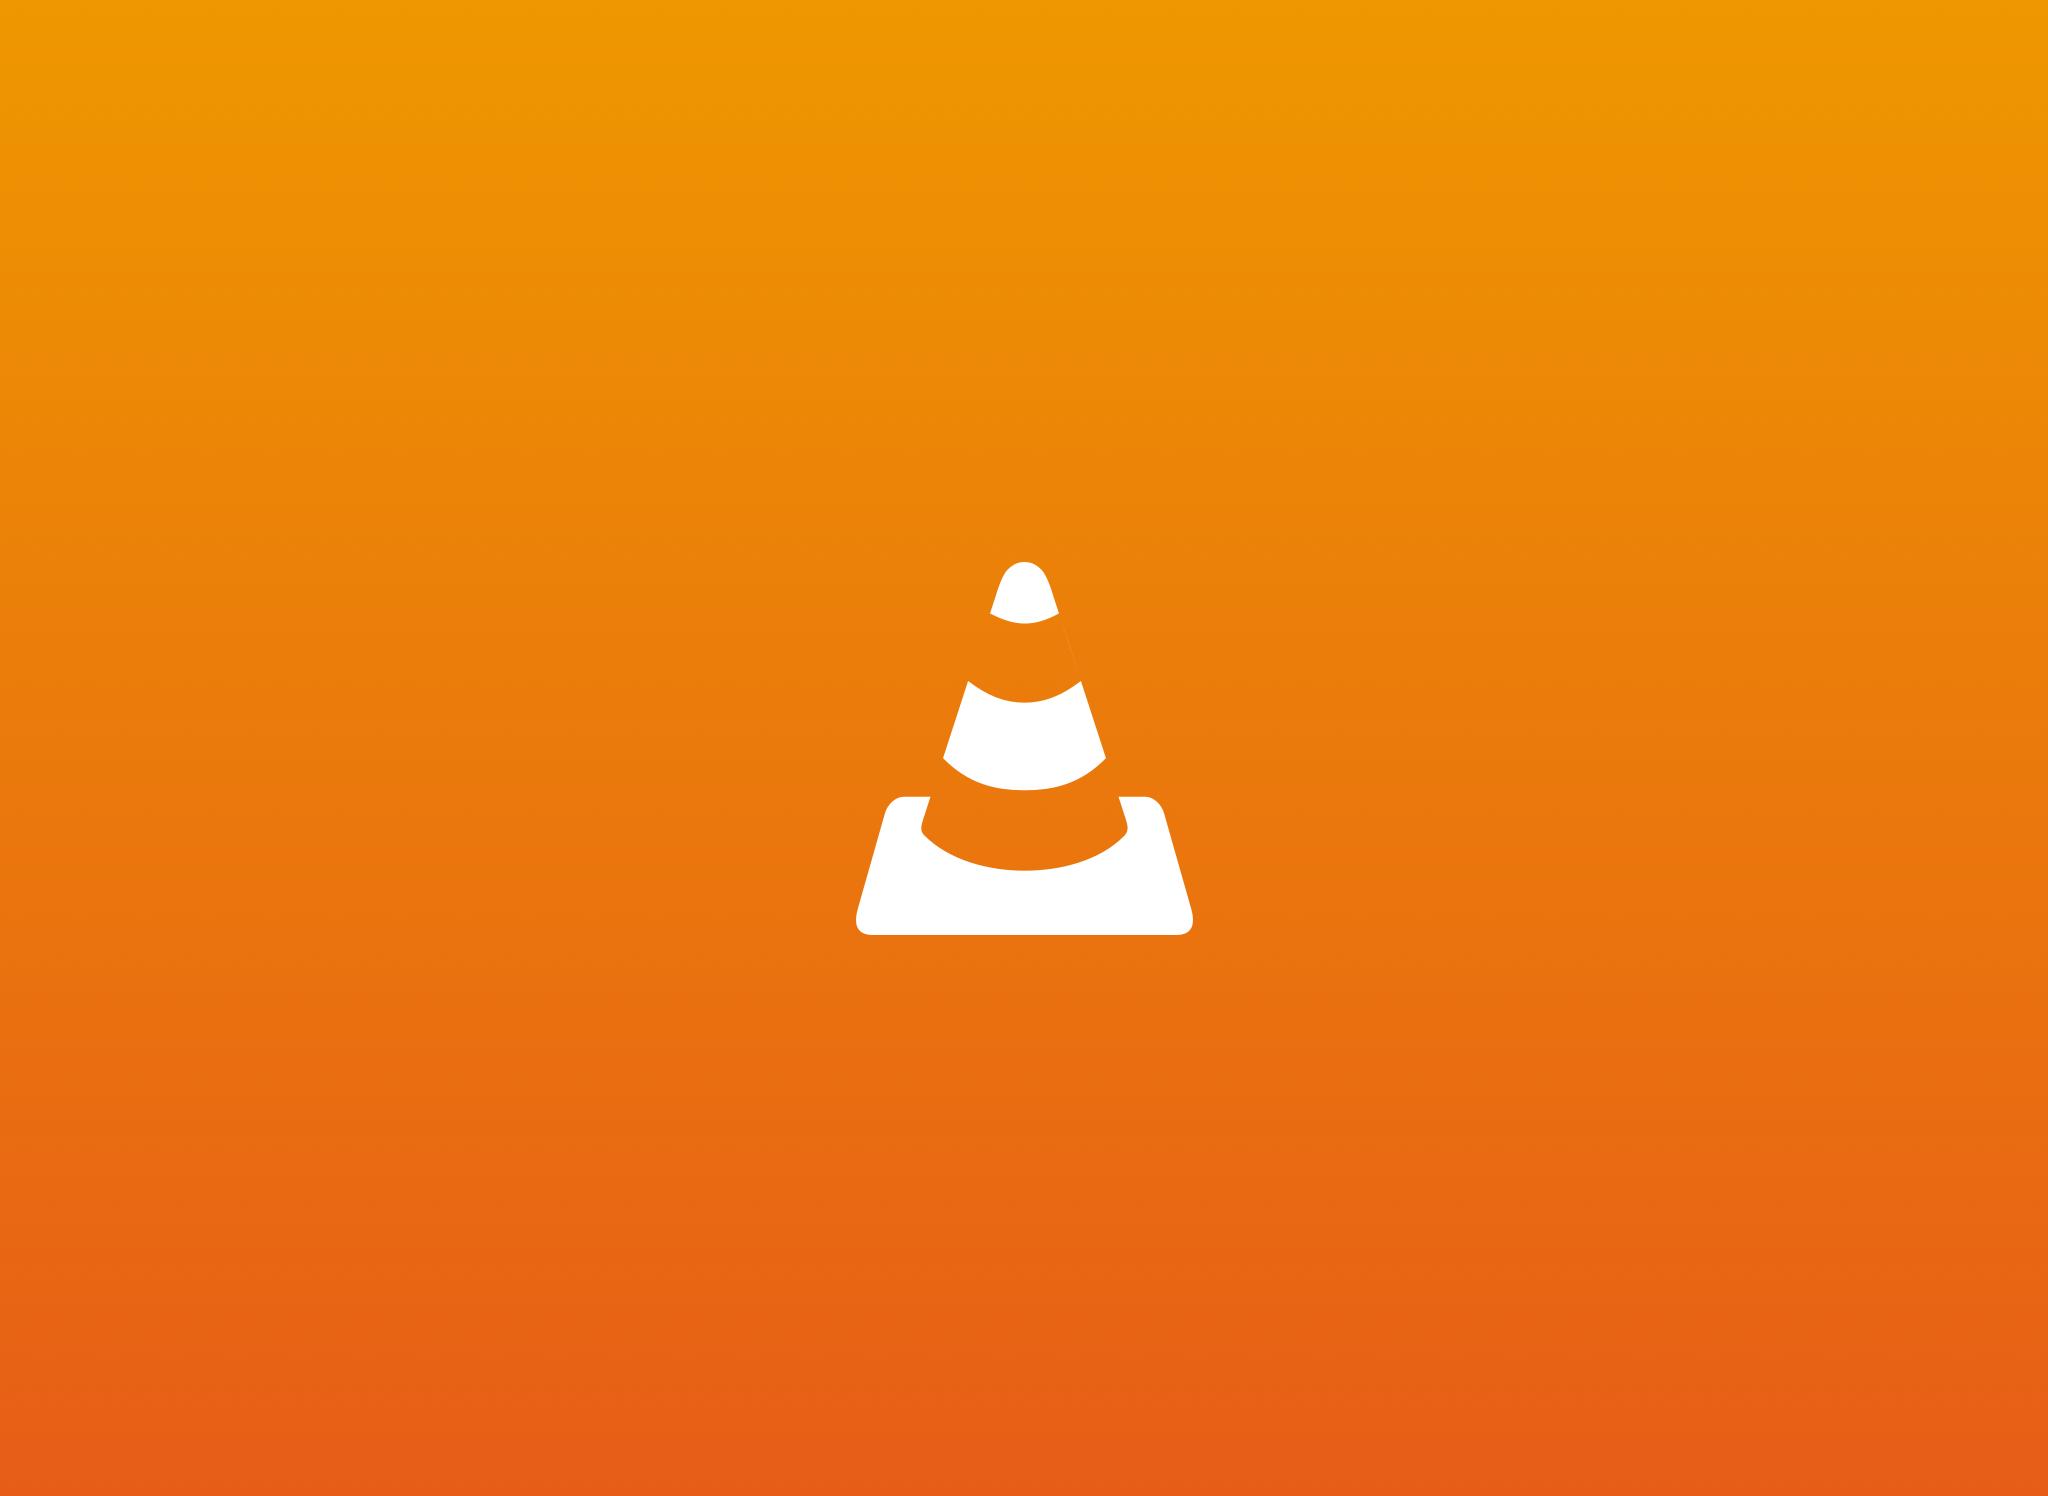 vlc-ios/Images.xcassets/LaunchImage.launchimage/iPad-ExcludeStatusBar-Landscape@2x.png